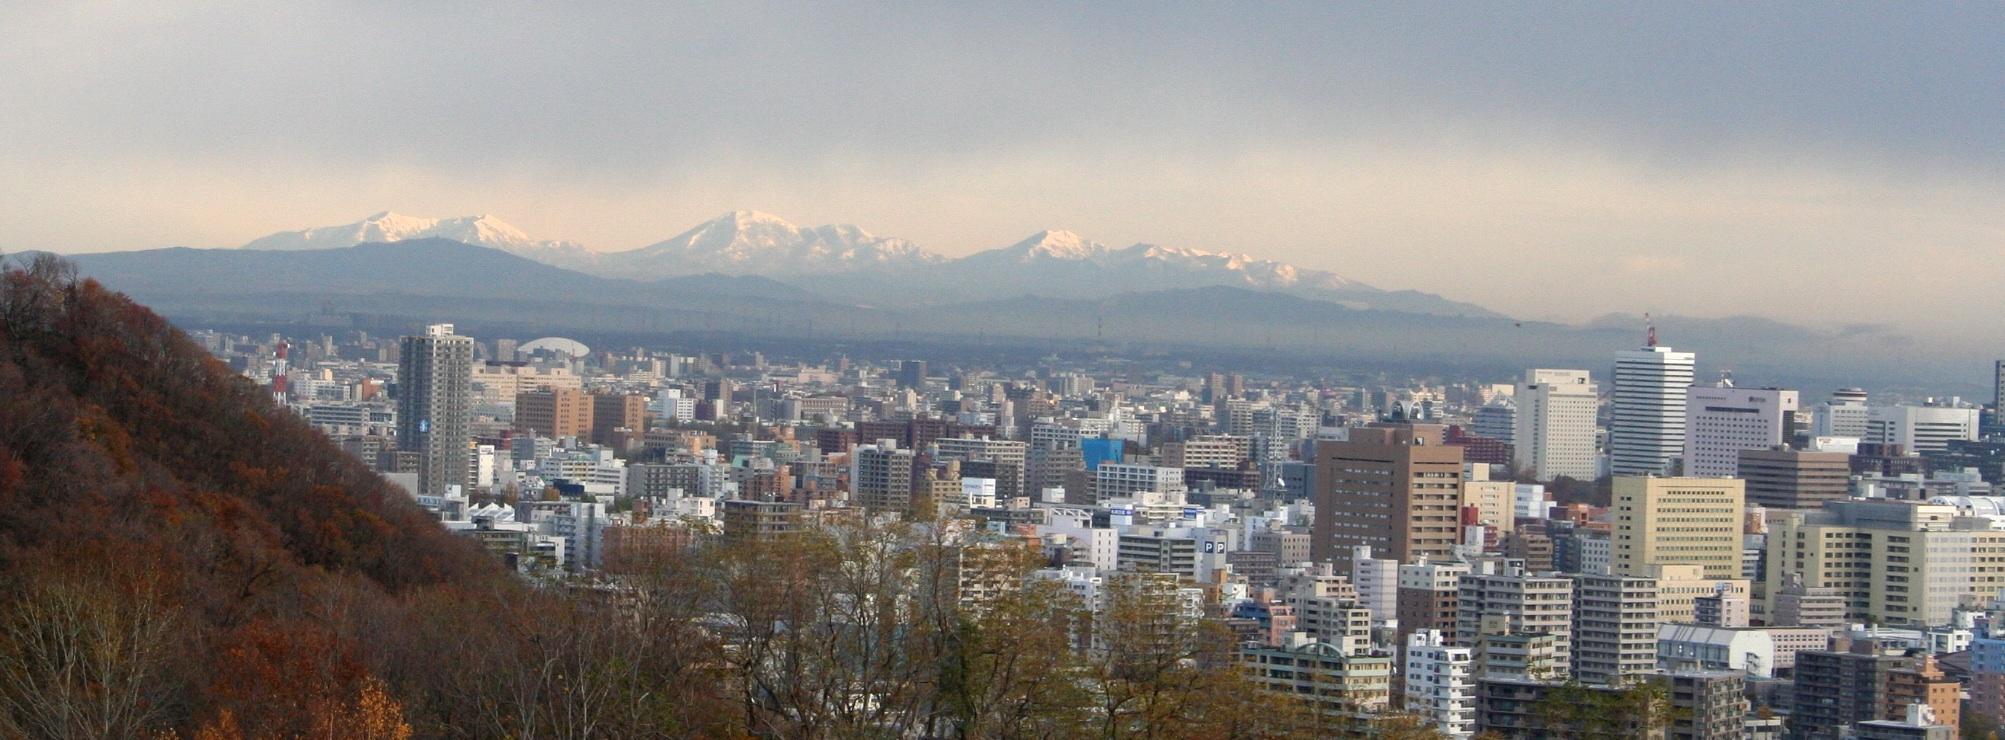 mountain051111.jpg